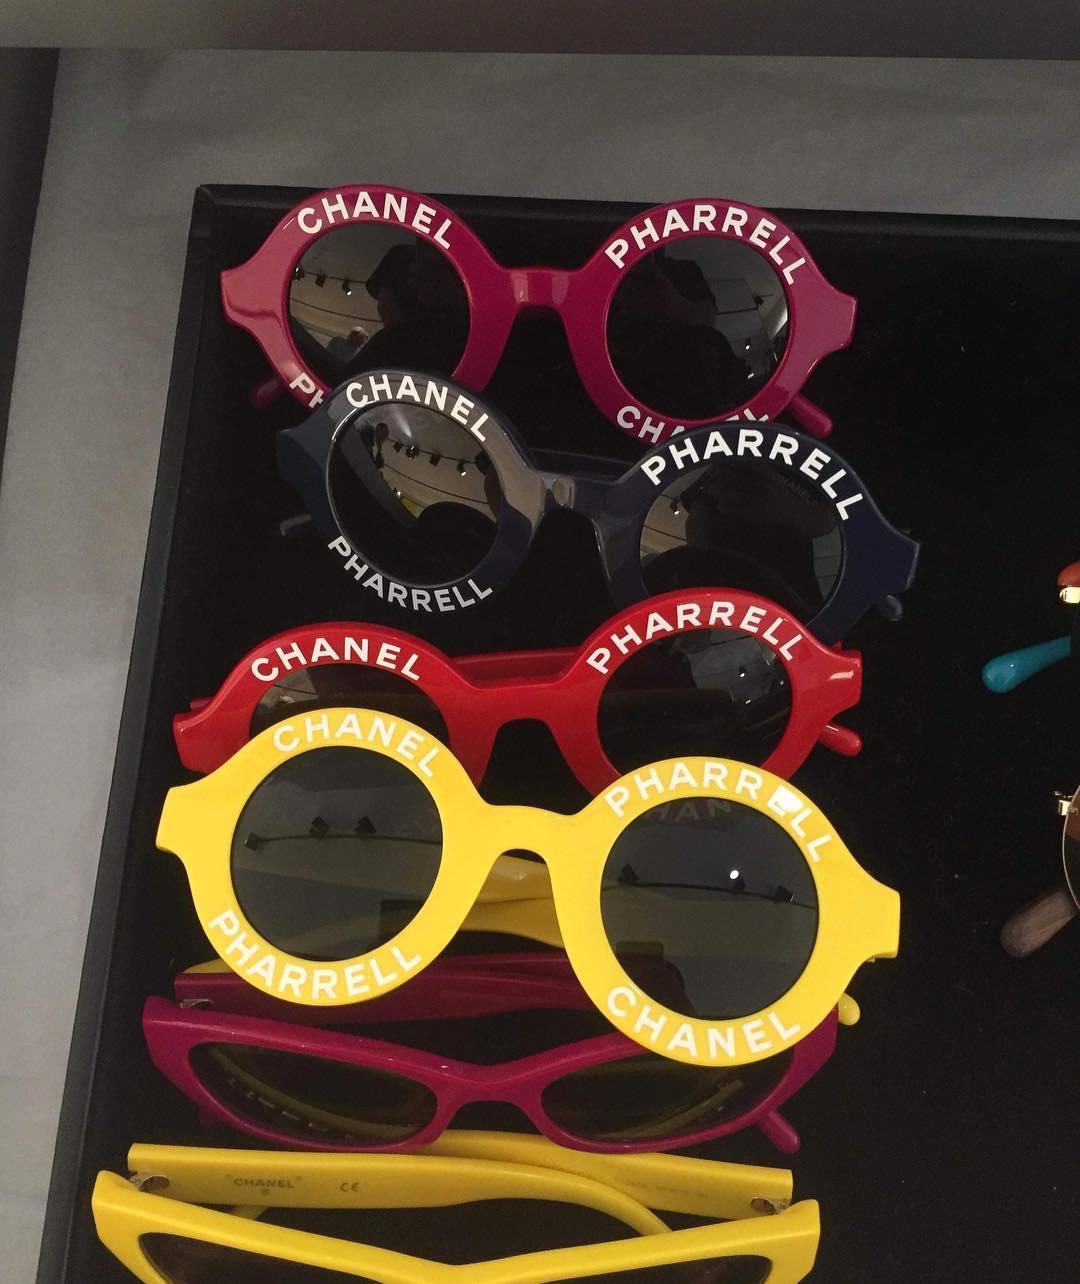 Chanel Pharrel woo store